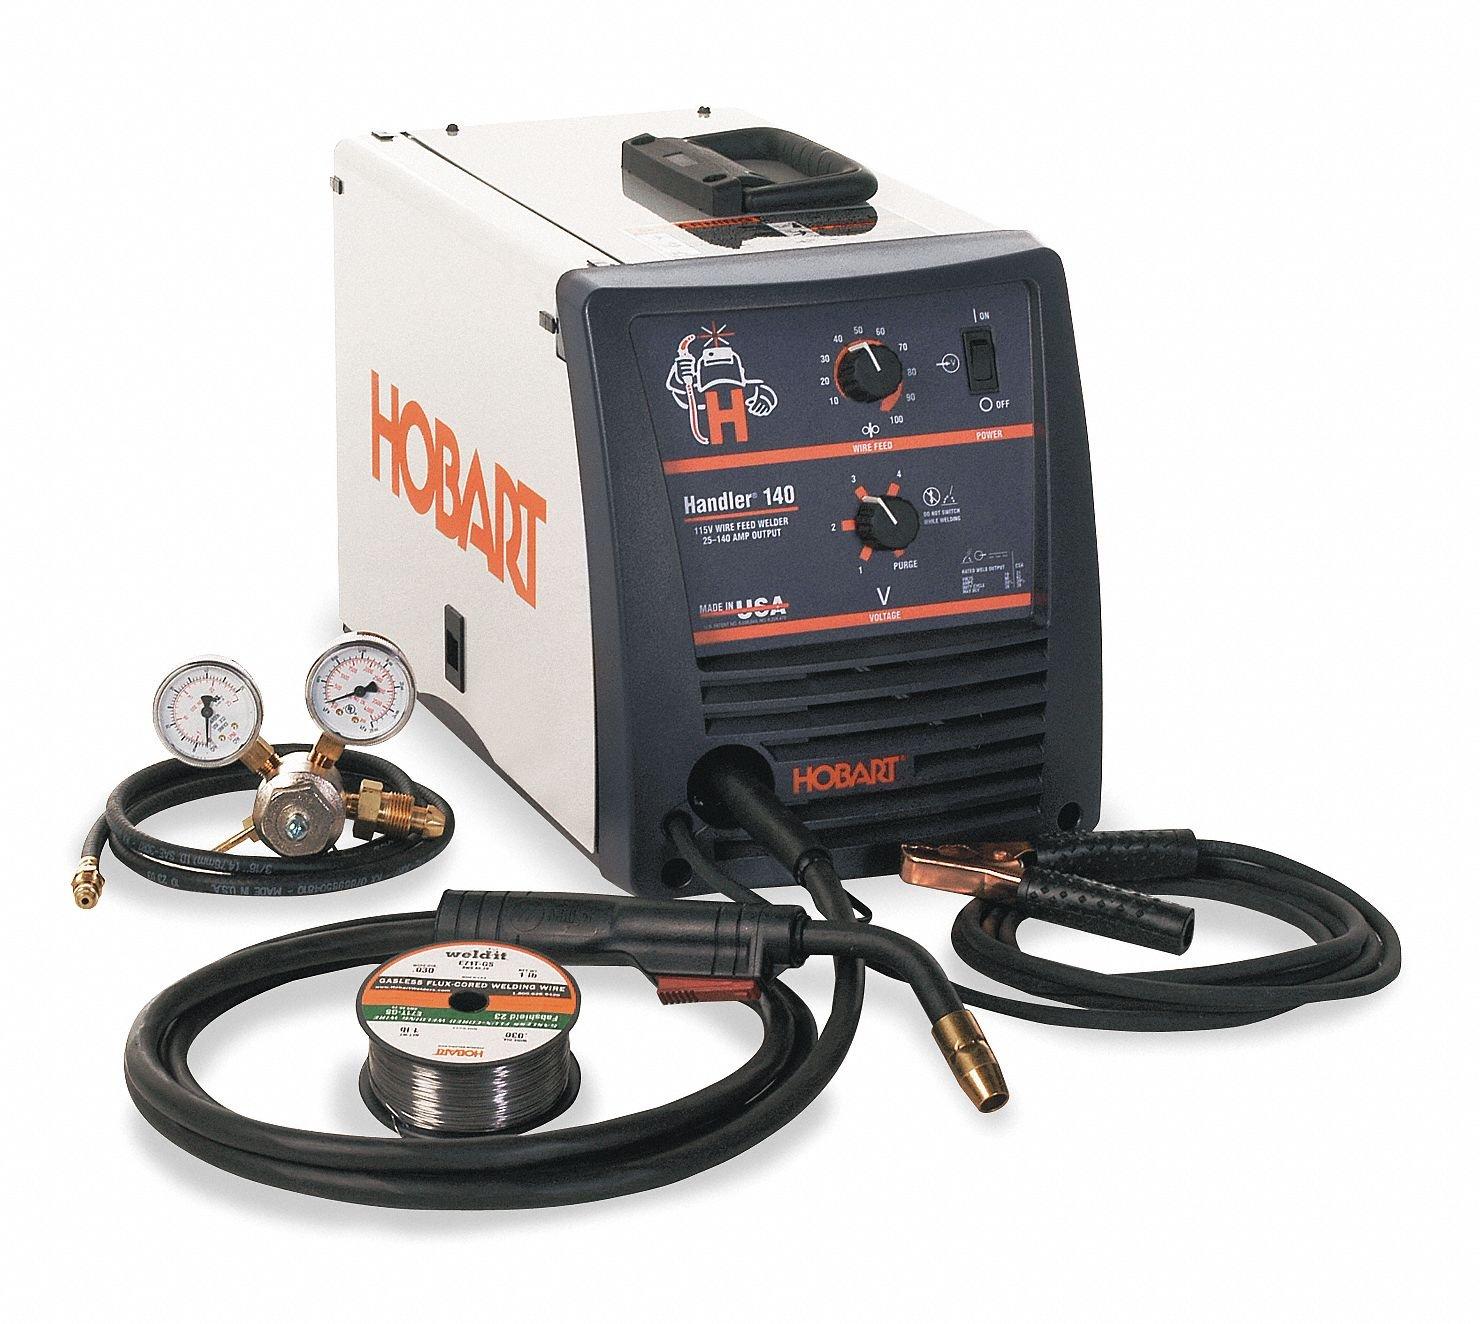 Hobart MIG Welder, Handler 140 Series, Input Voltage: 120VAC